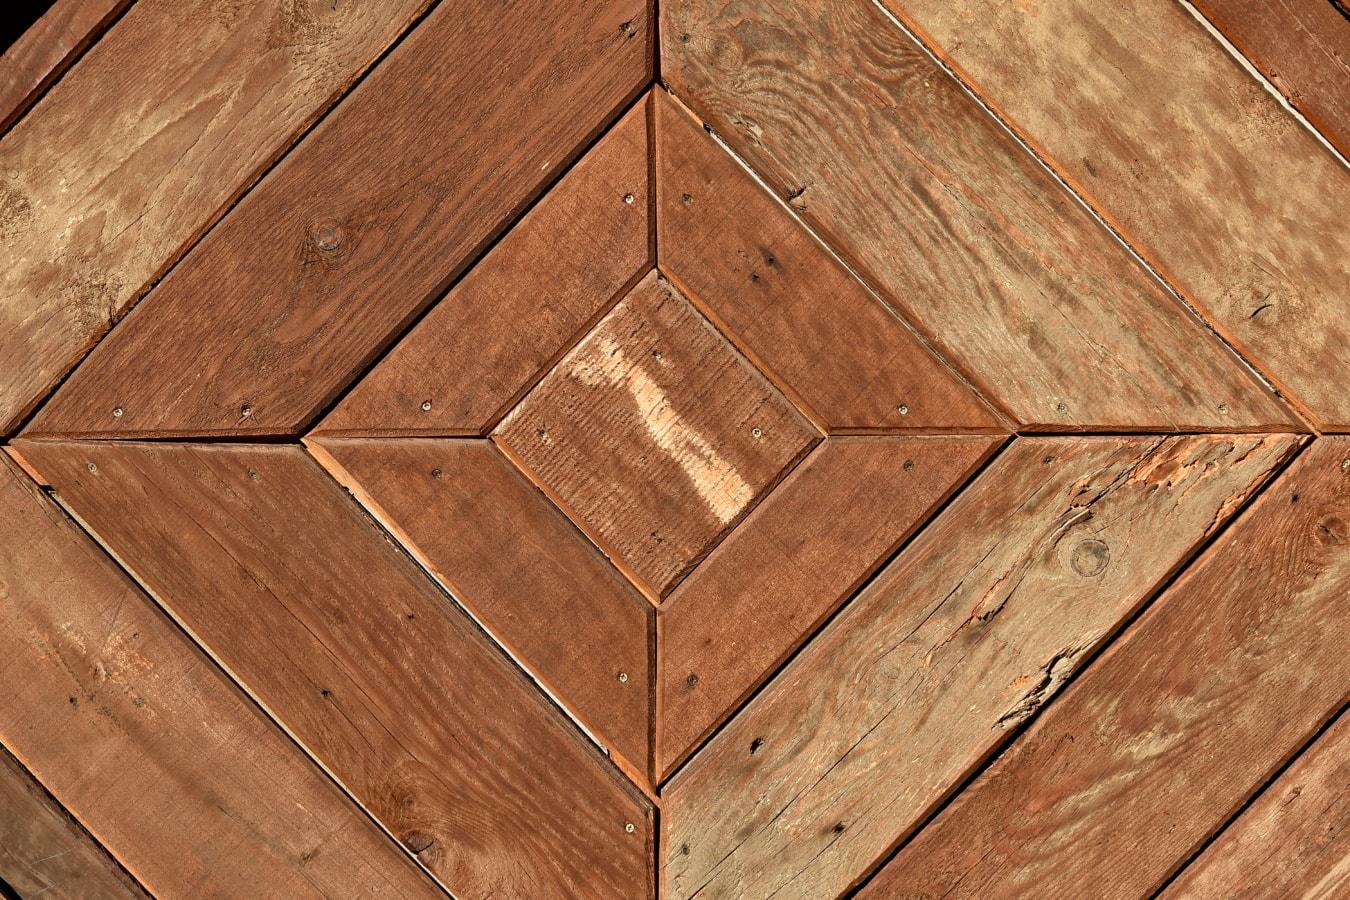 design, square, frame, carpentry, hardwood, brown, retro, wood, rough, material